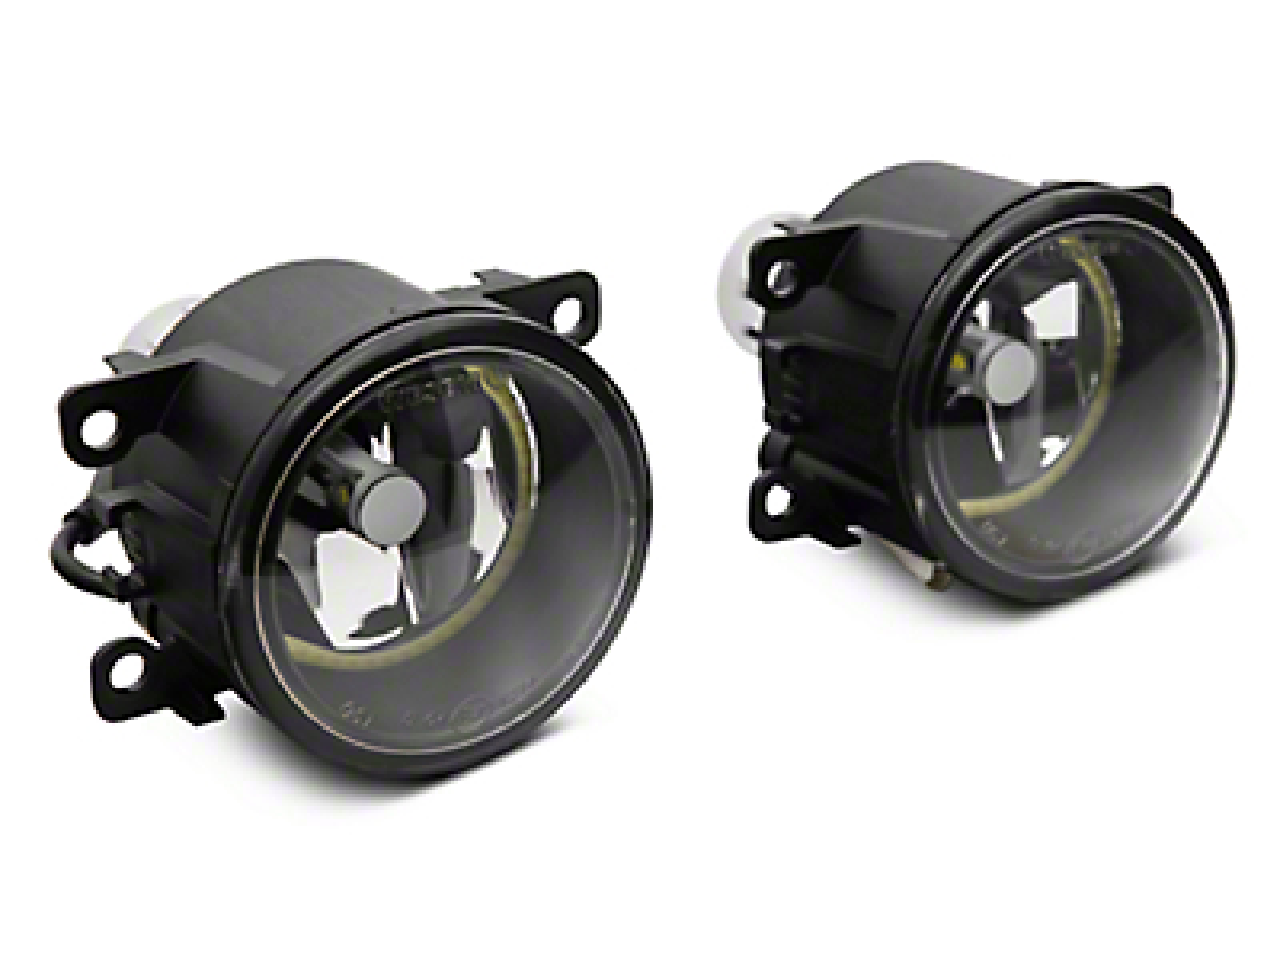 Delta 3088 Series 3.5 in. LED Fog Lights w/ Halos (07-18 Jeep Wrangler JK)